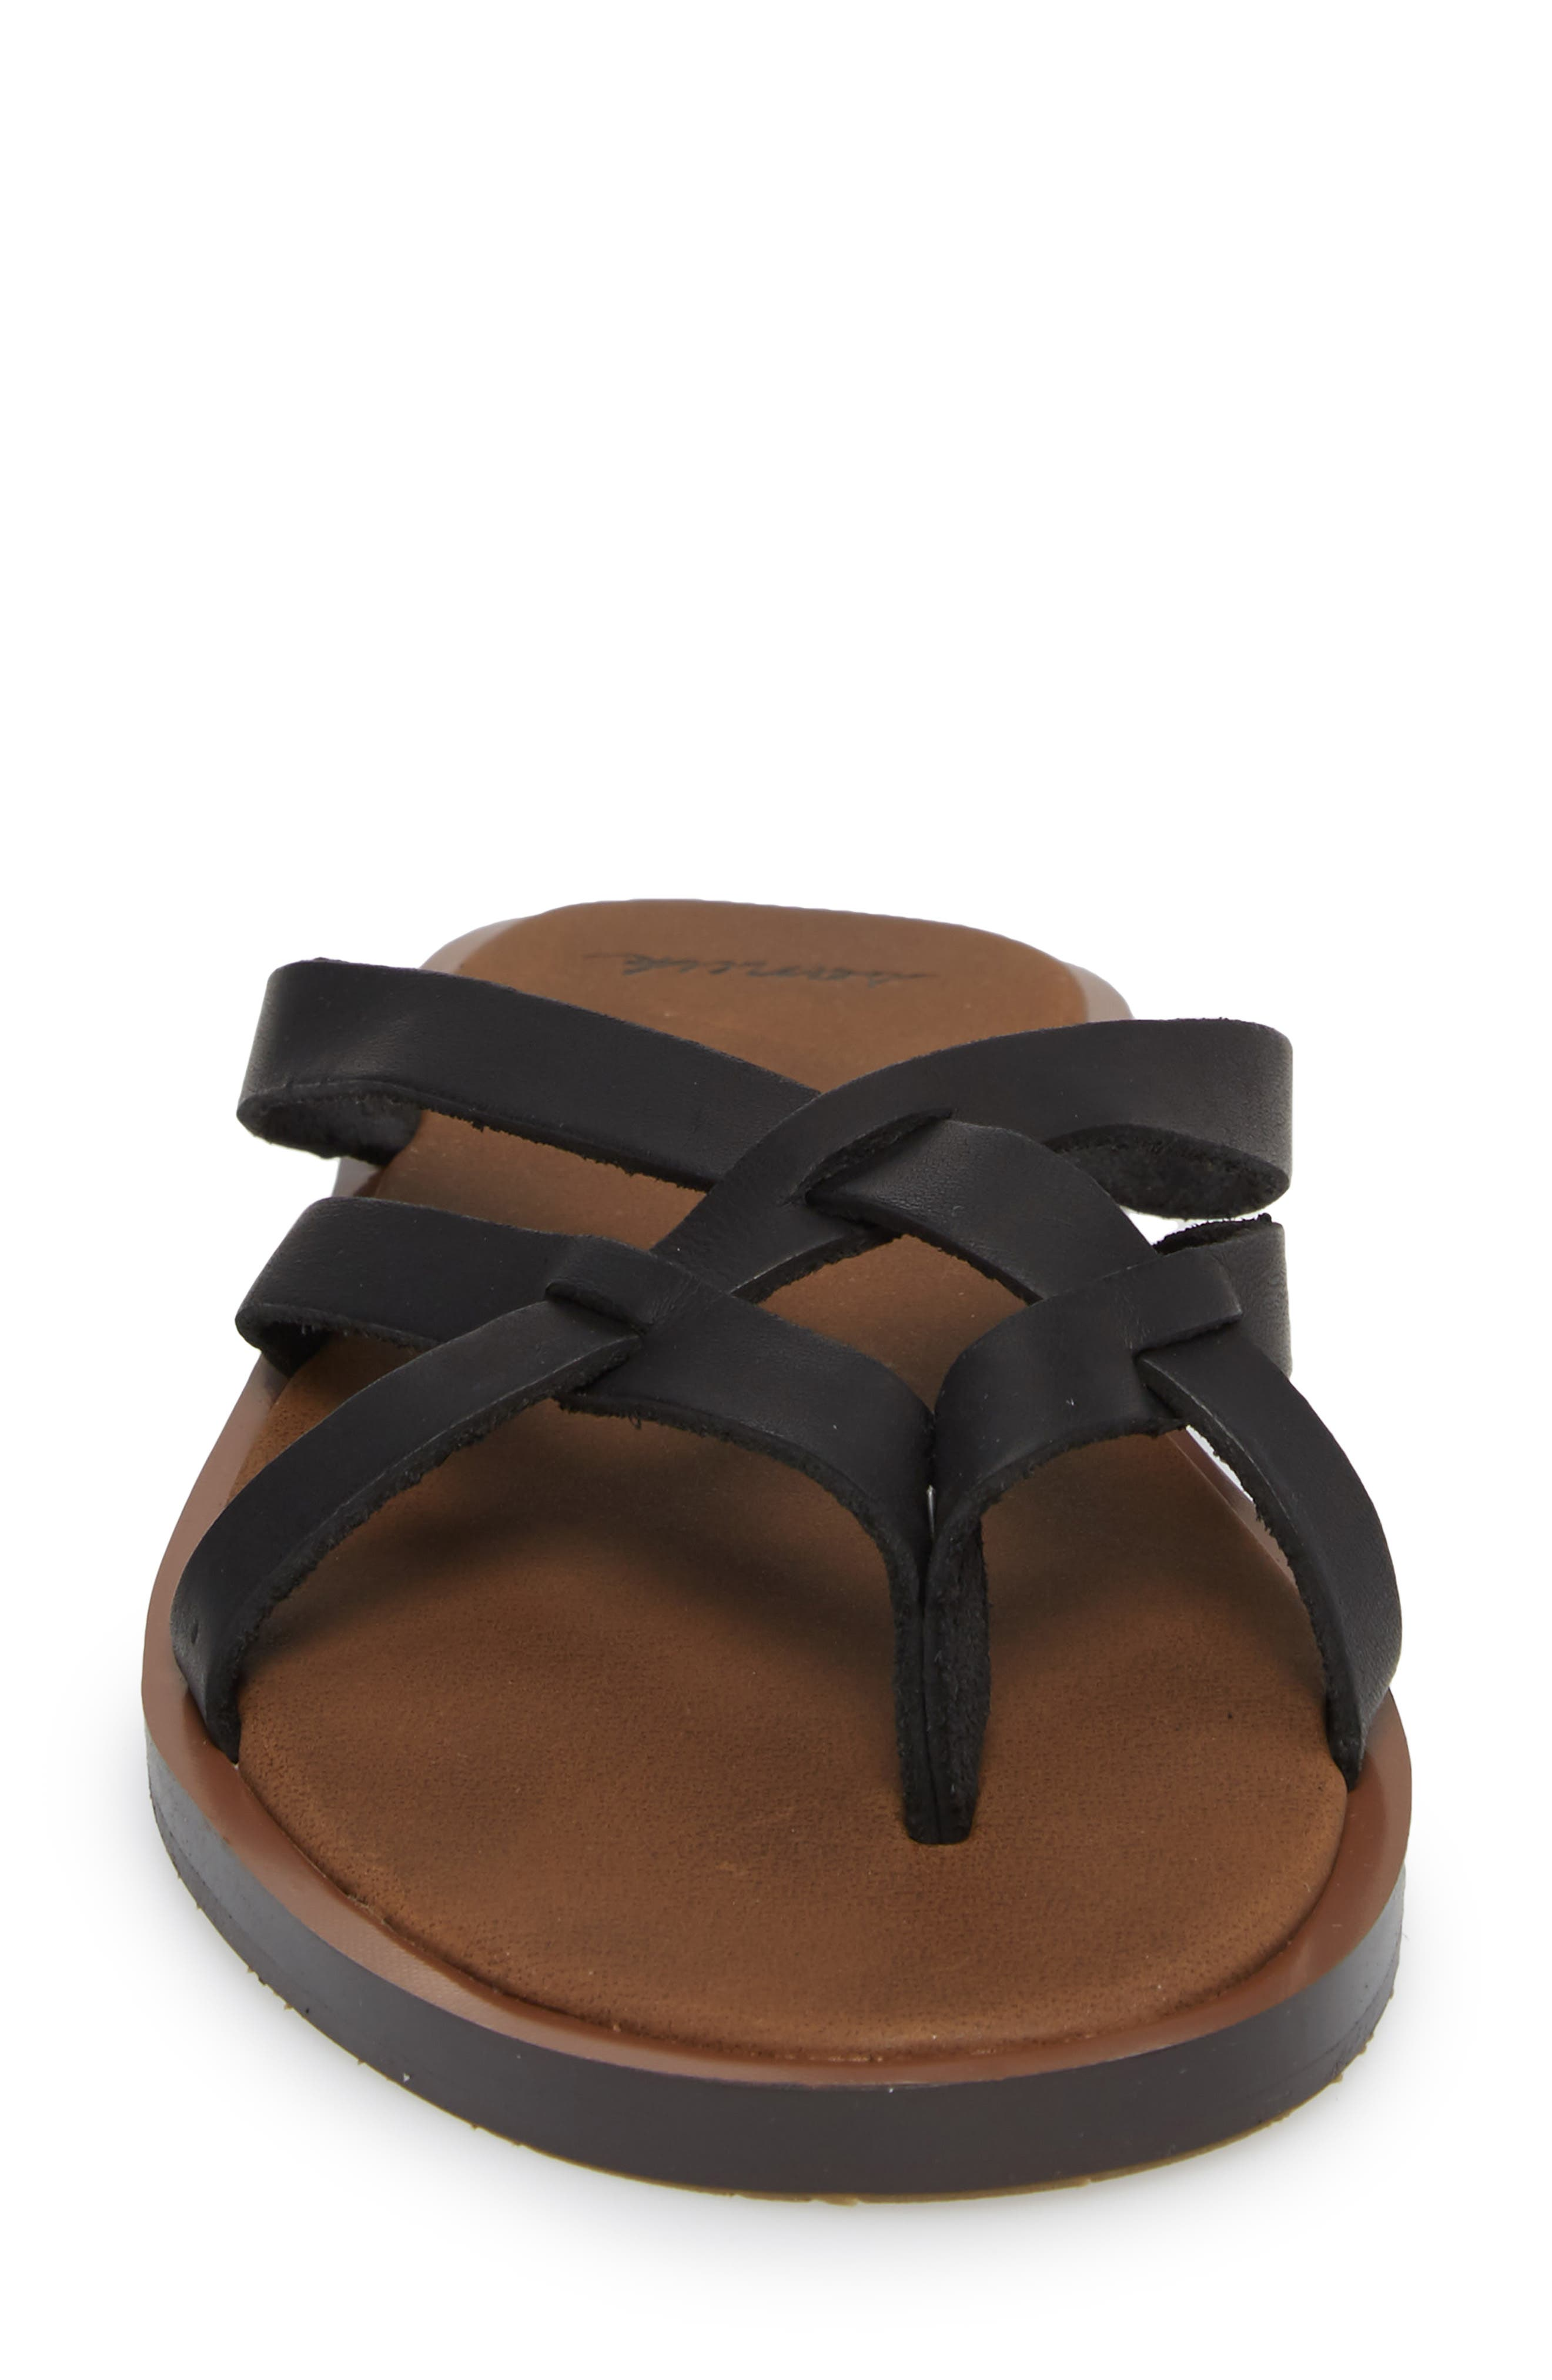 Yoga Strappy Thong Sandal,                             Alternate thumbnail 4, color,                             001